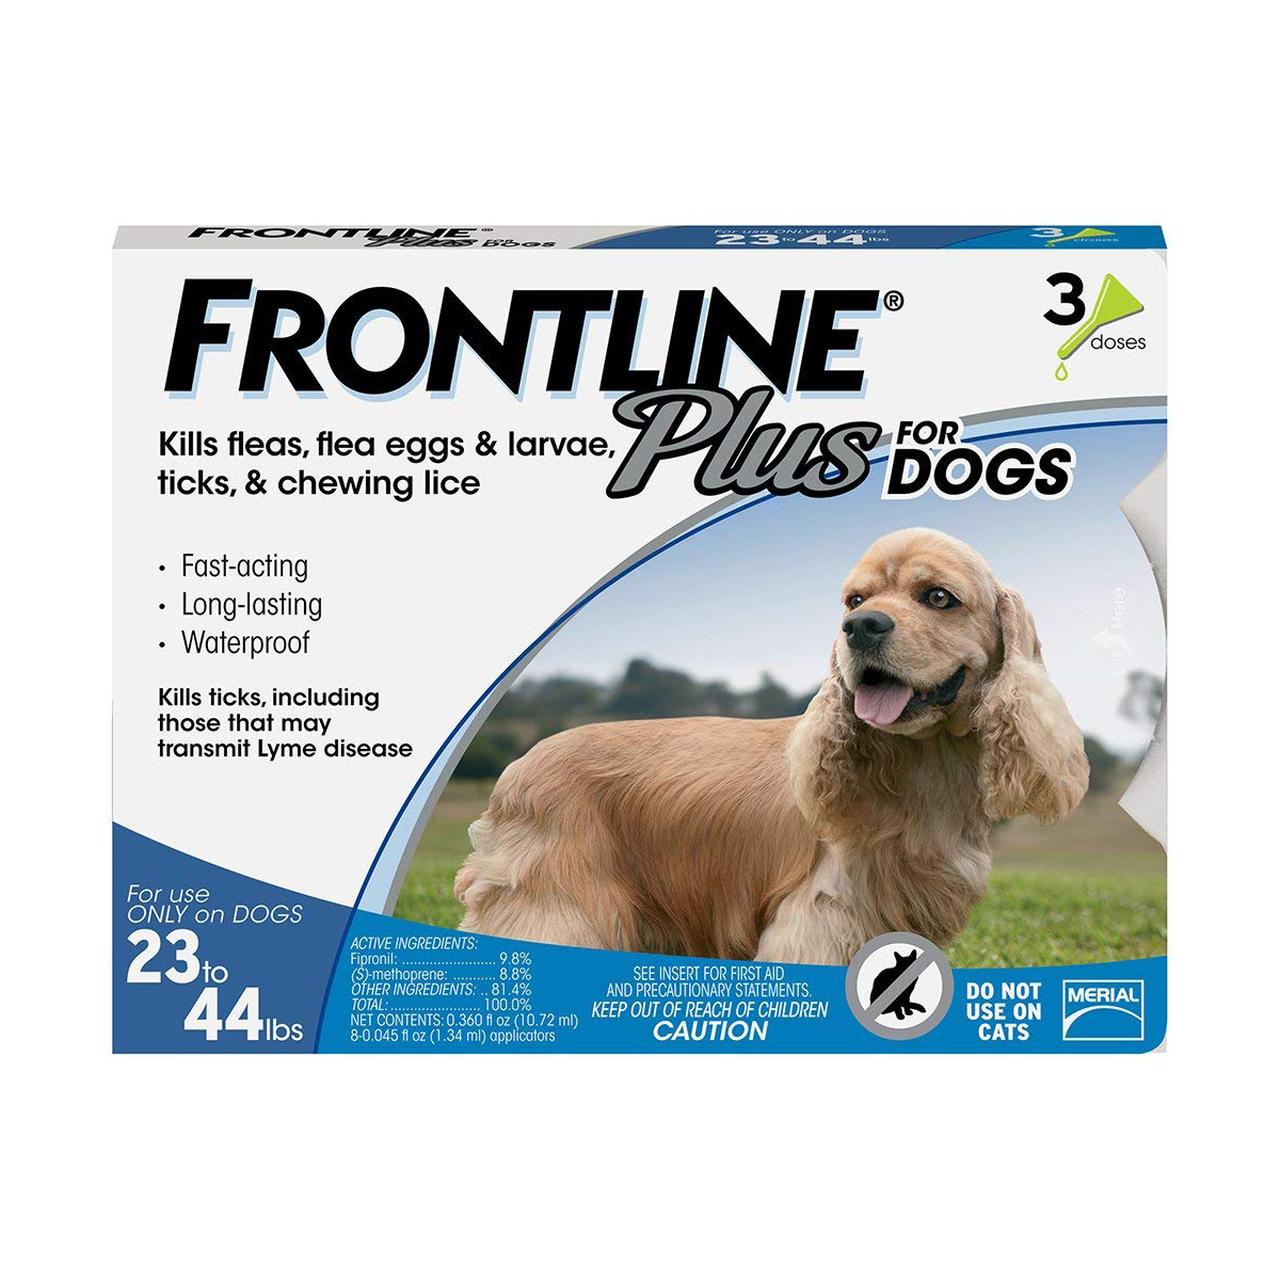 FRONTLINE Plus Flea & Tick Treatment for Medium Dogs (23-44 pounds)